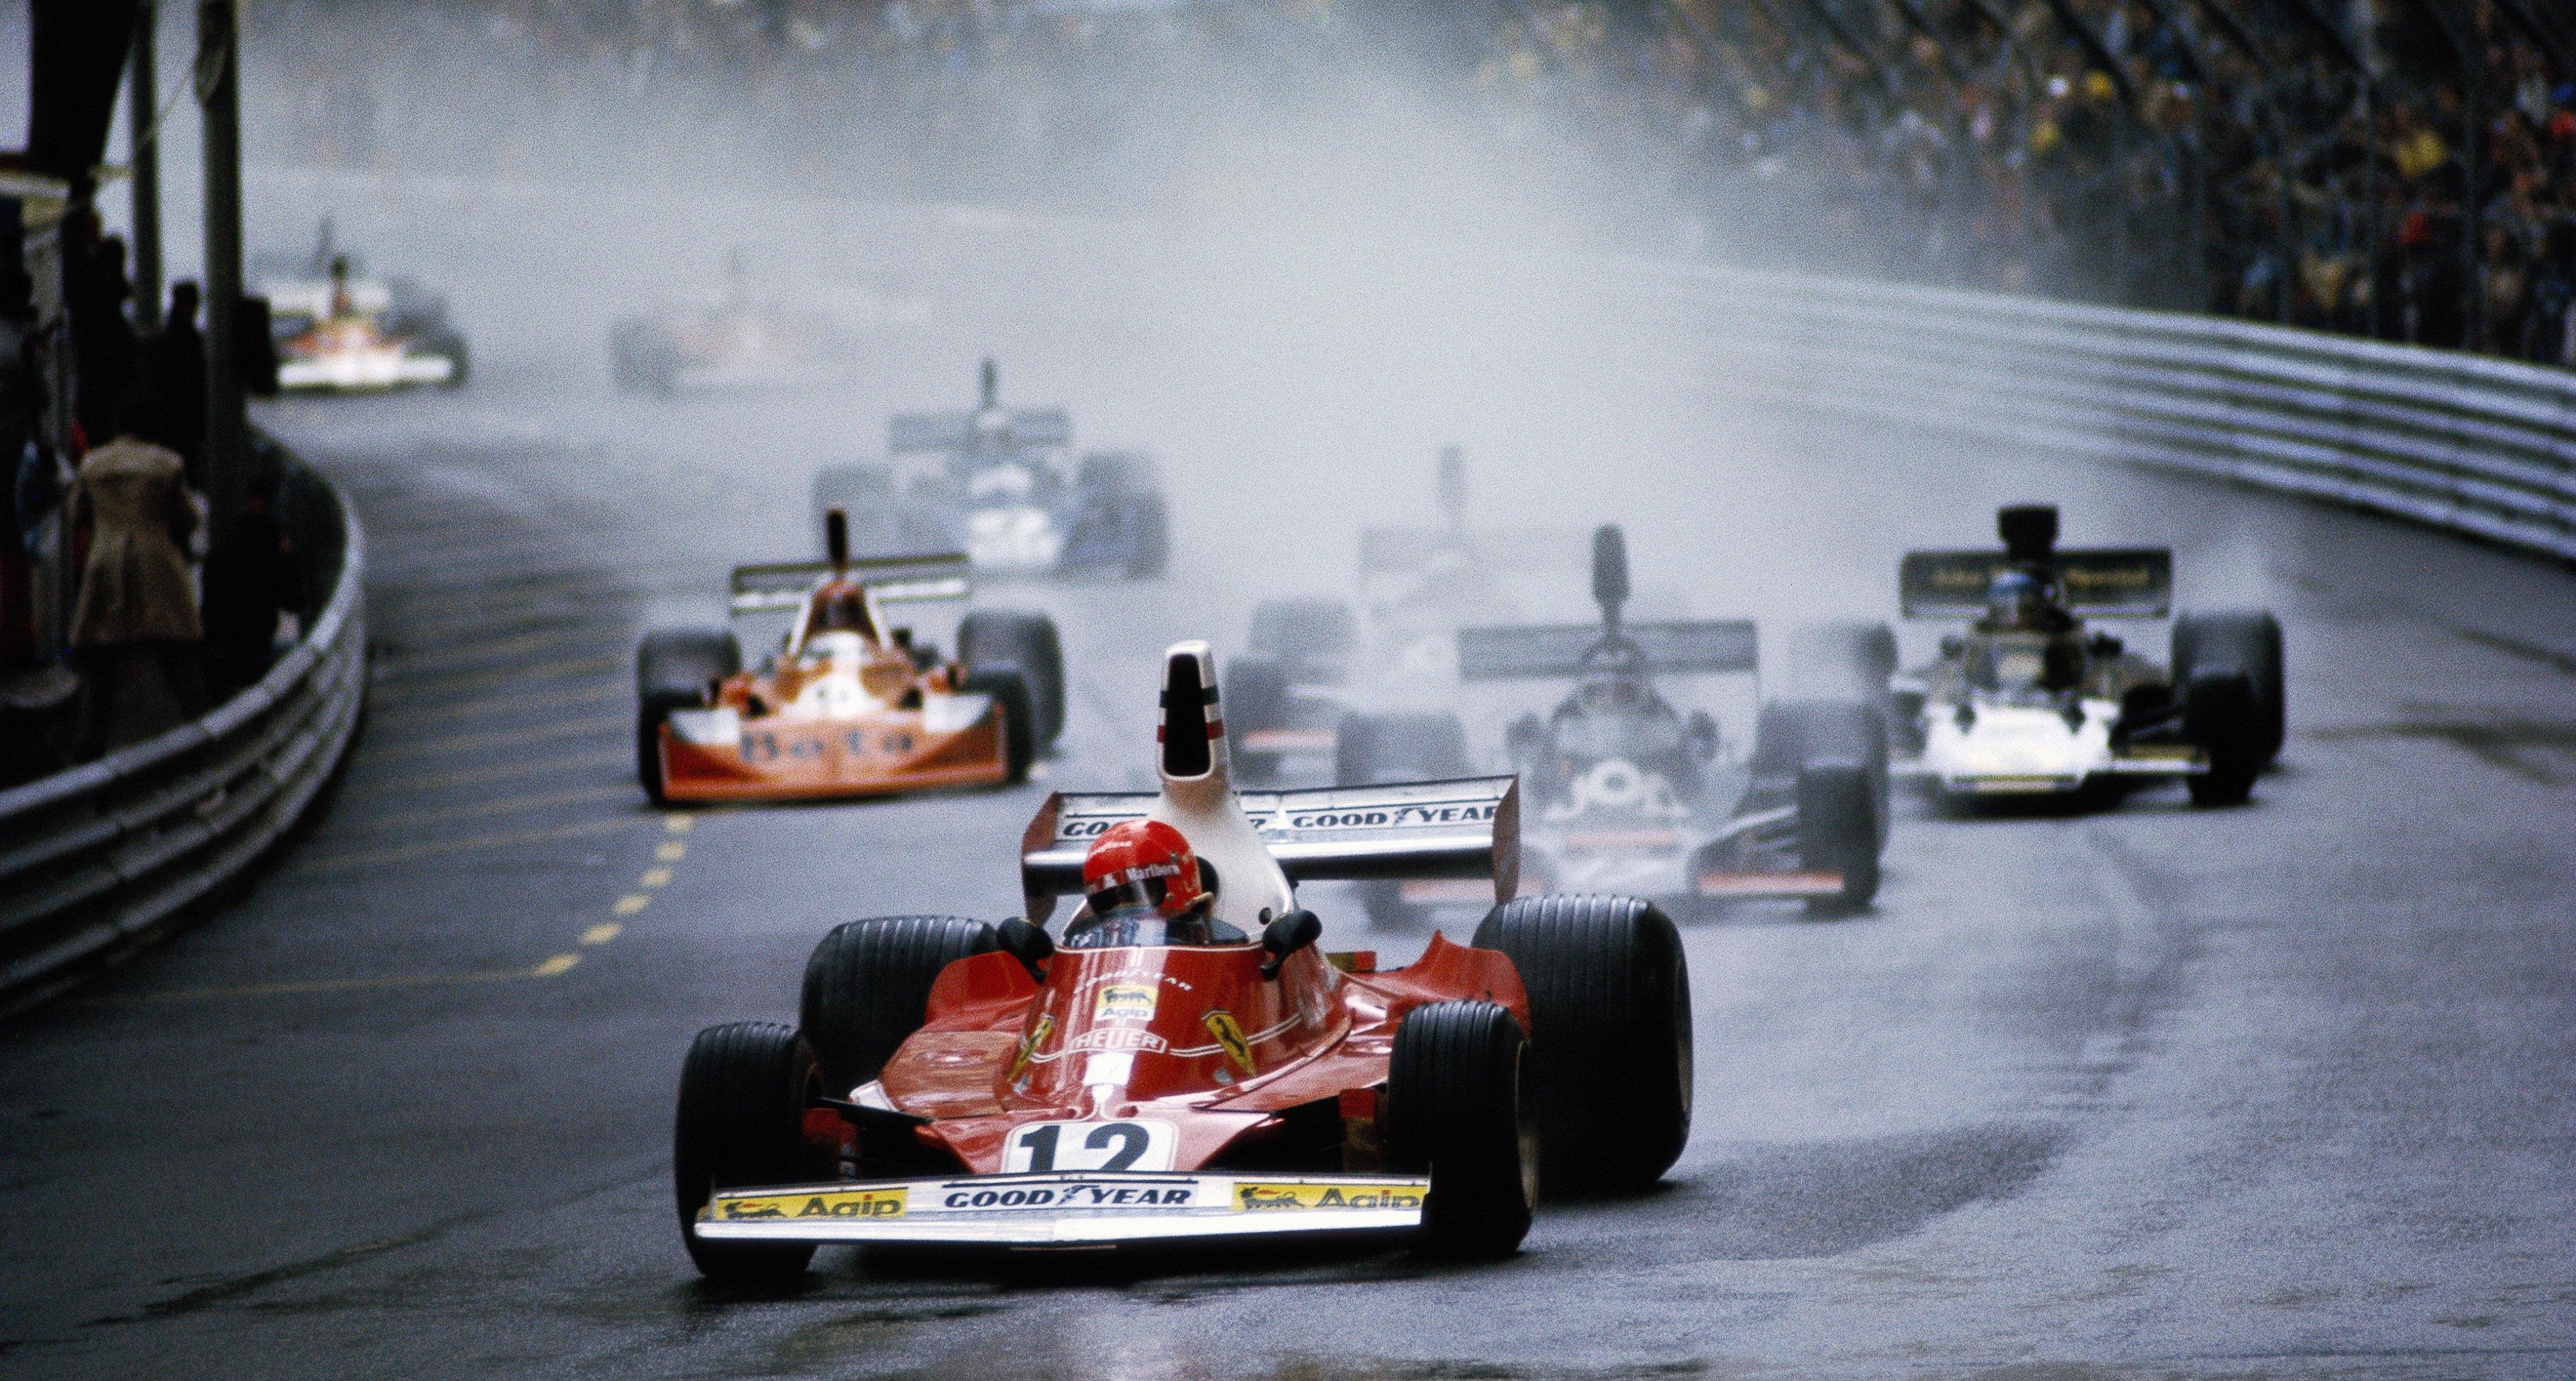 Ferrari's Niki Lauda leads Jean-Pierre Jarrier at the 1975 Monaco Grand Prix.